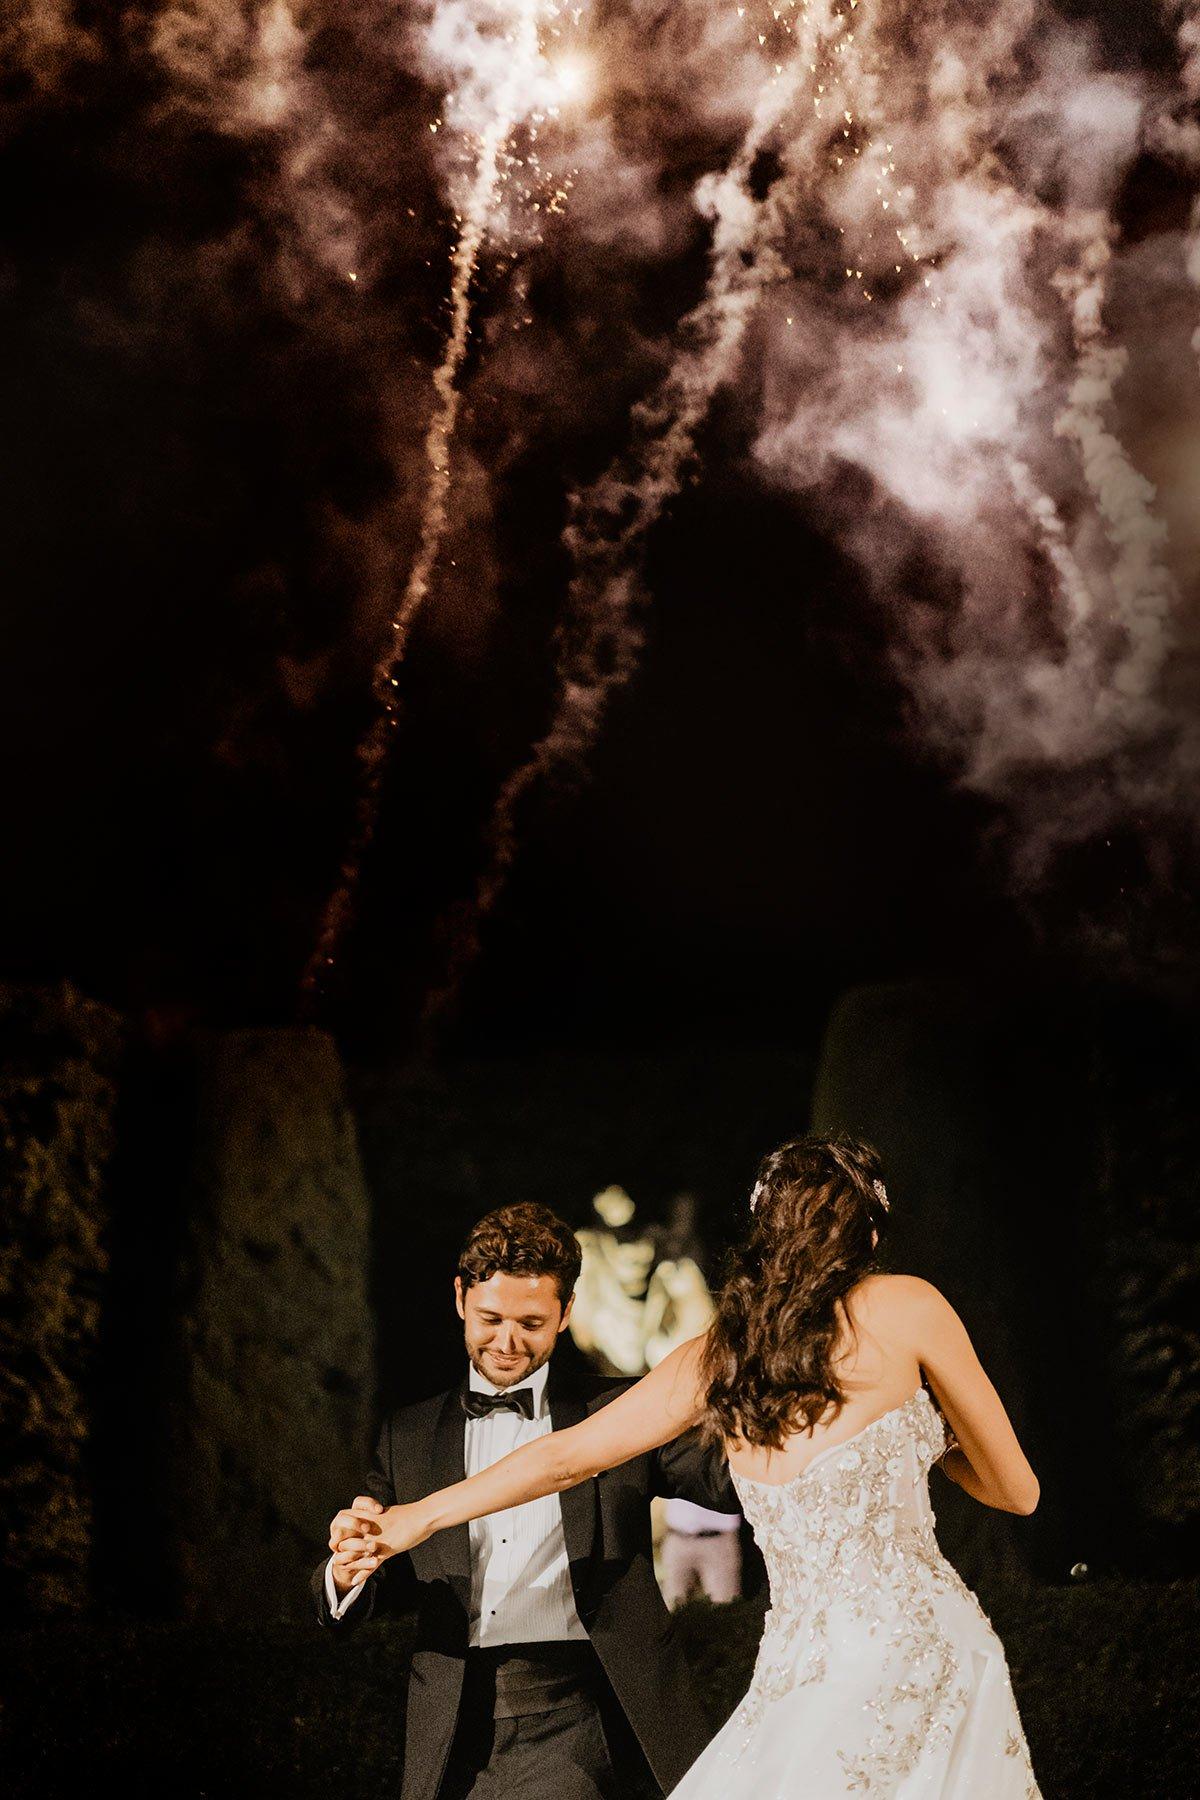 Ranya and Tarek, first dance